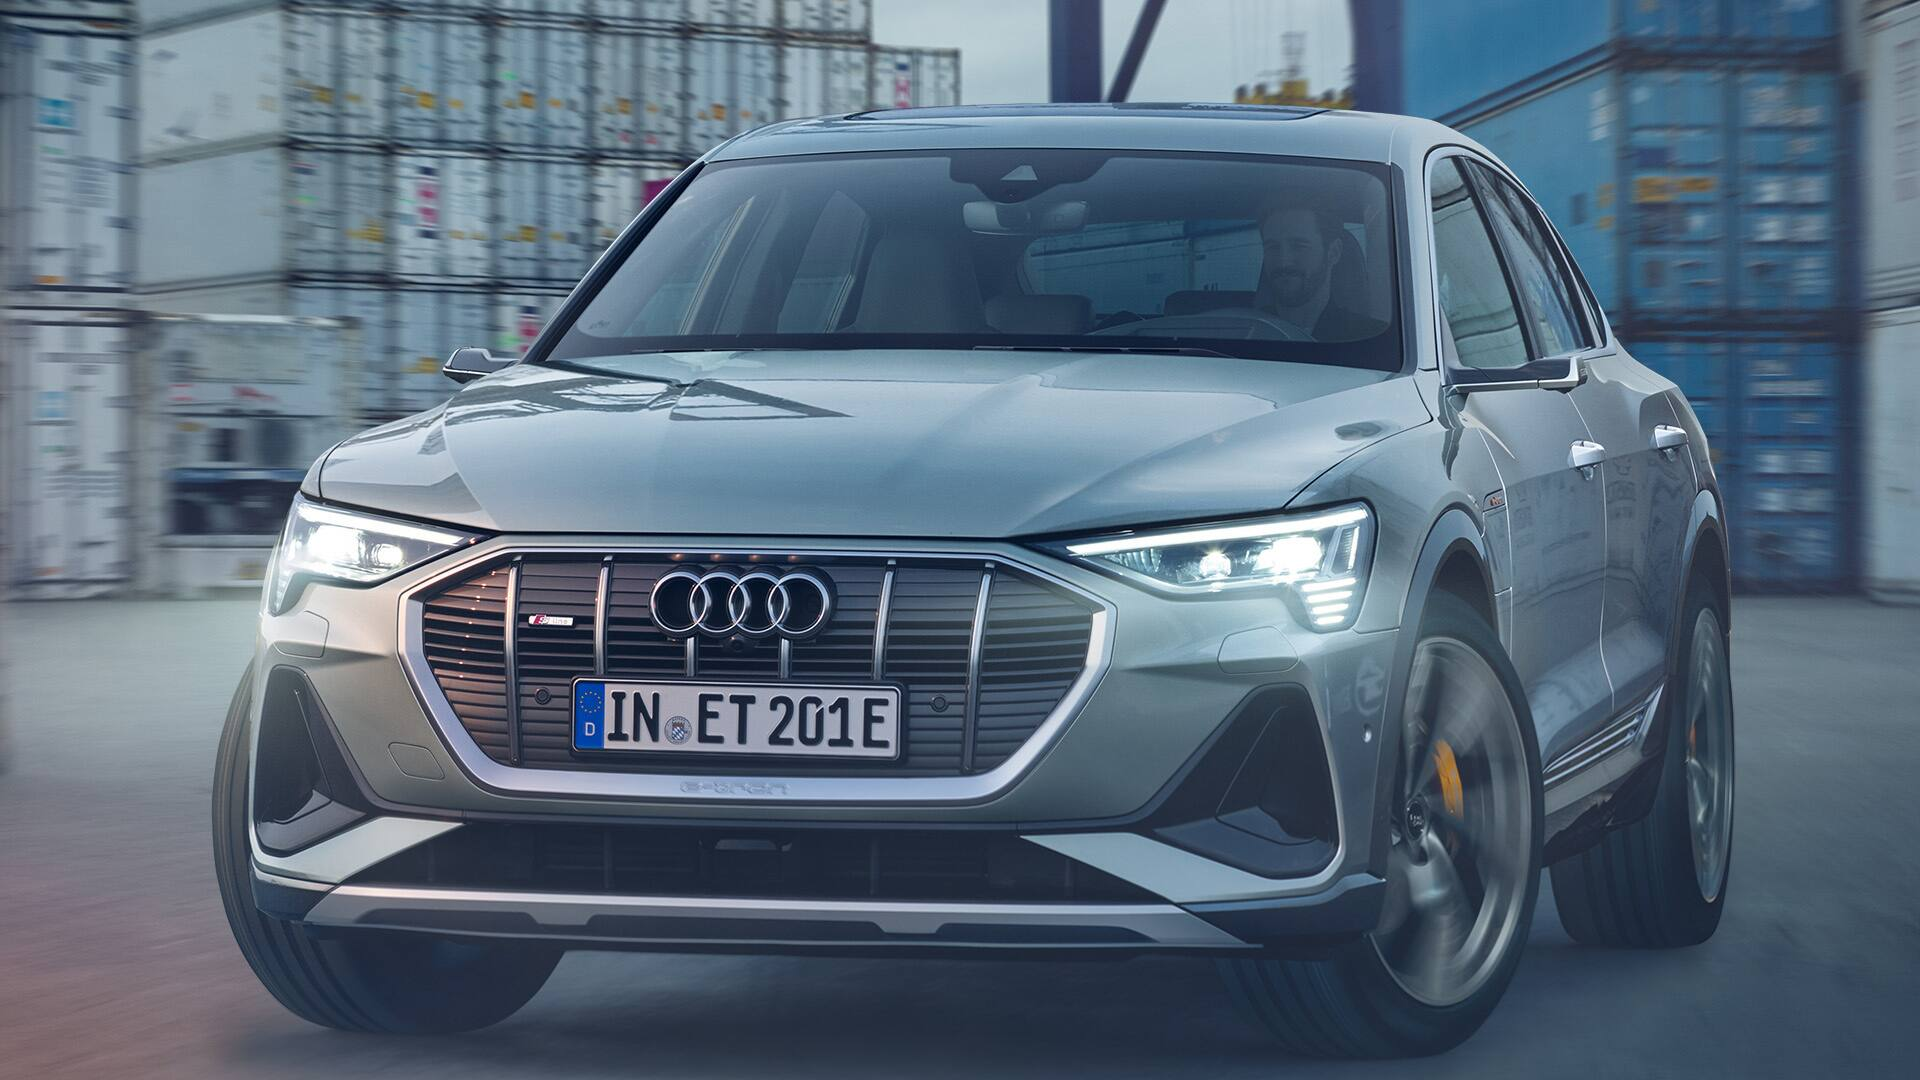 Der Audi e-tron Sportback inmitten des Rotterdamer Hafens